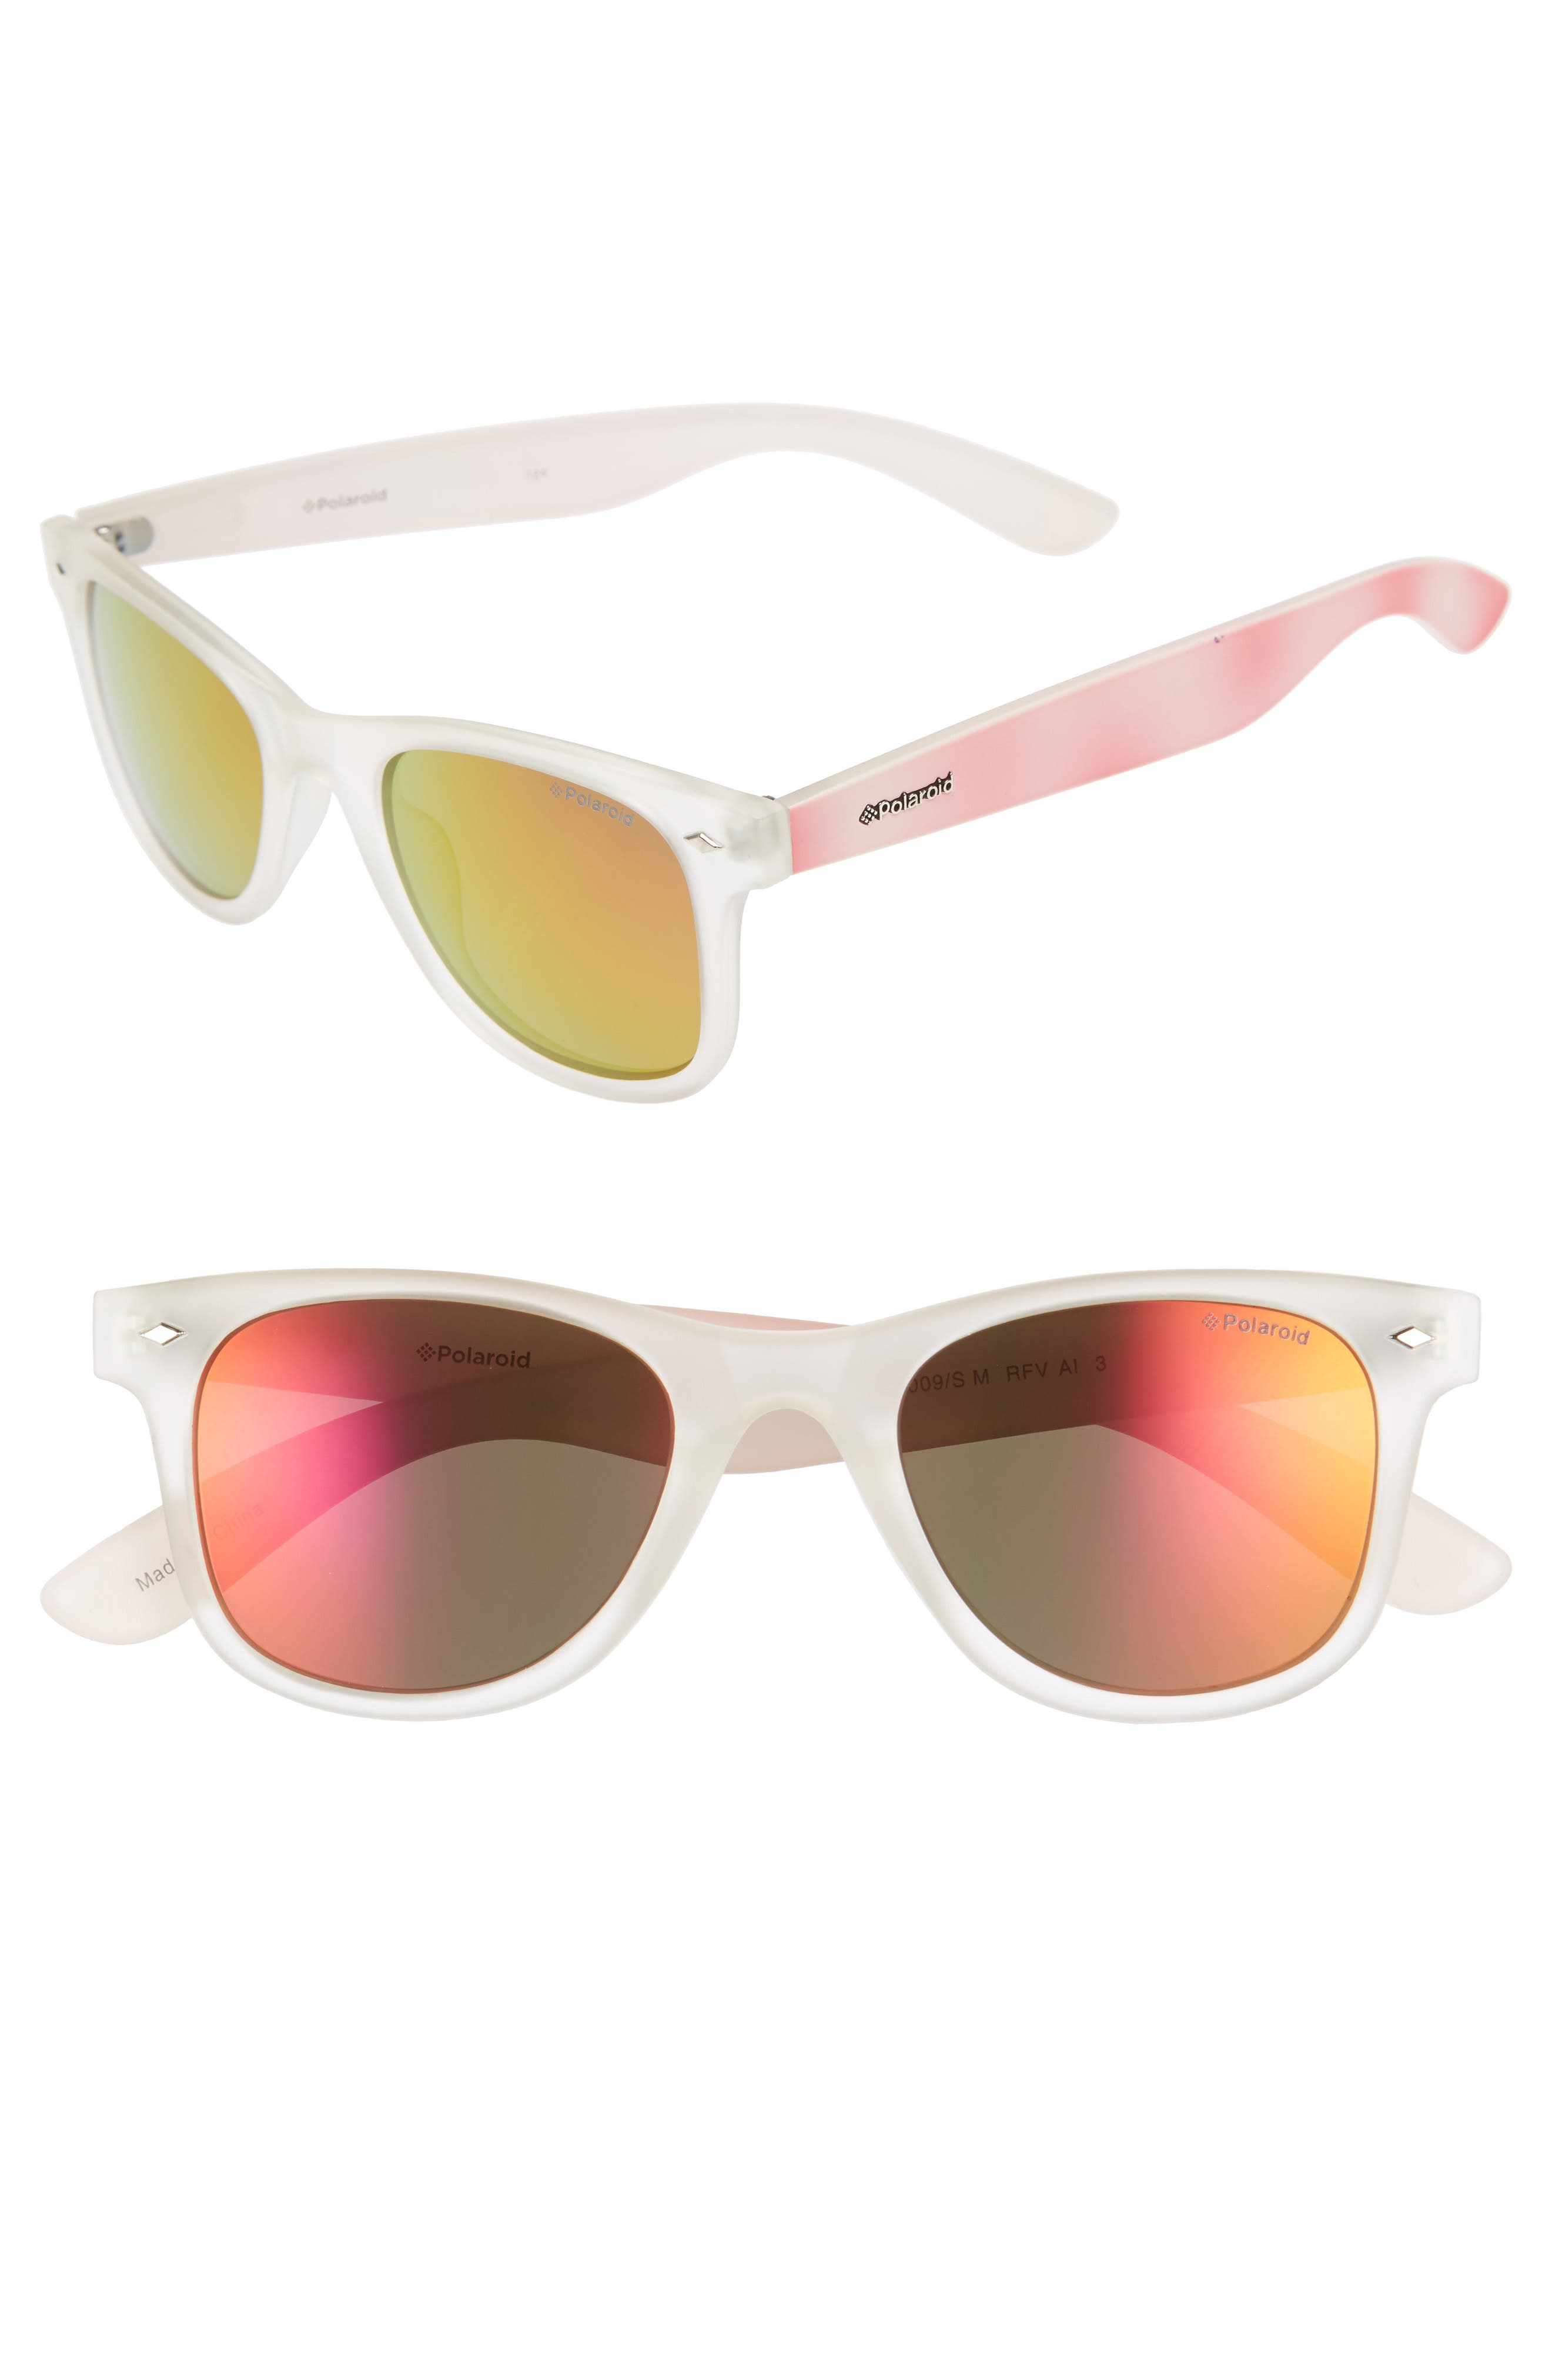 50mm Polarized Sunglasses,                         Main,                         color, Bright Pink